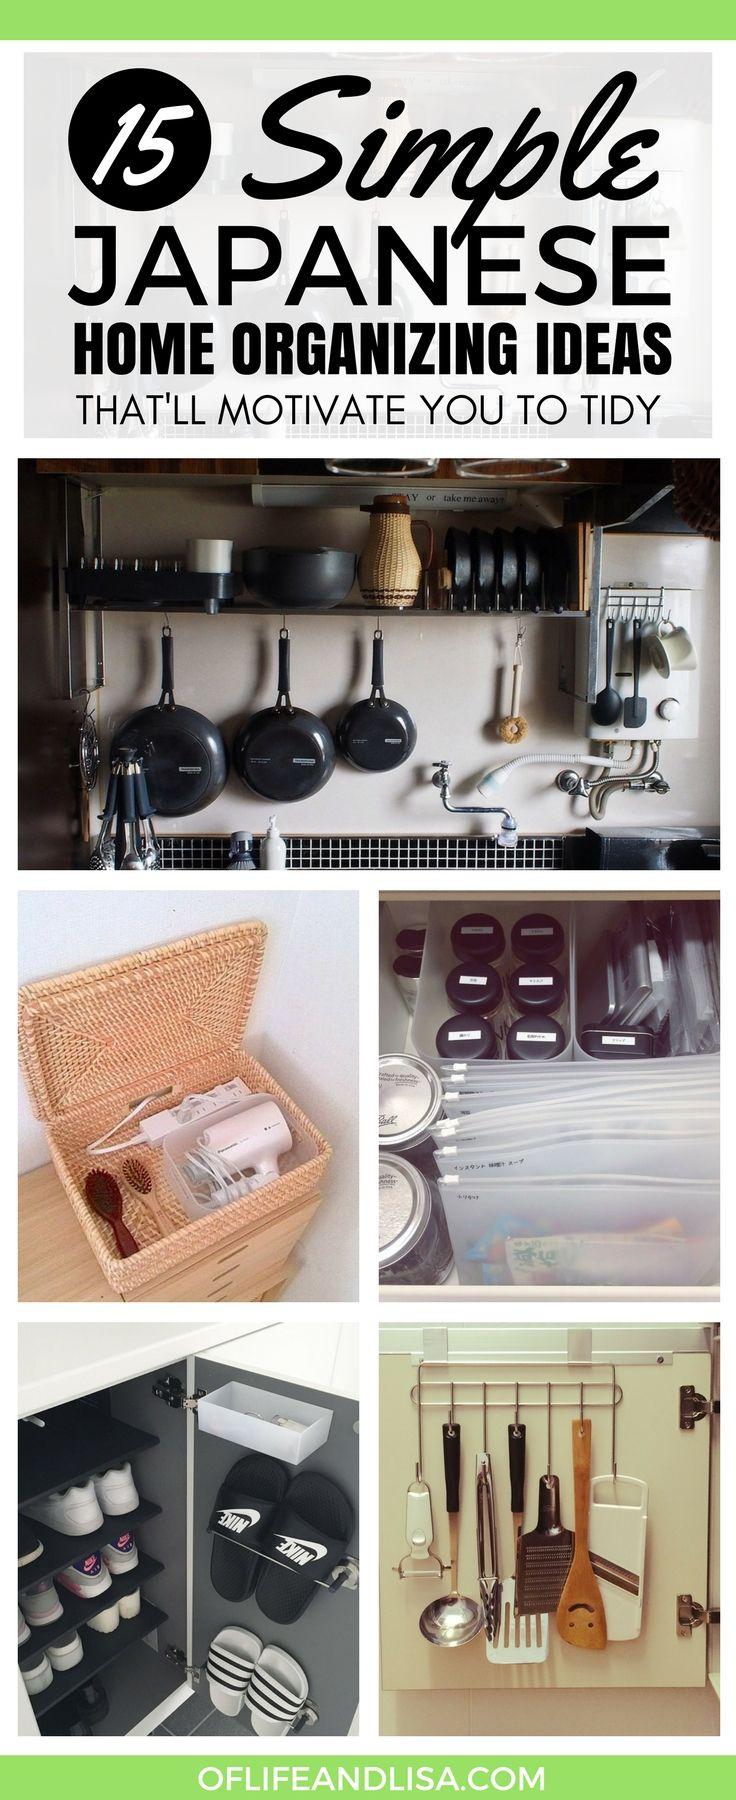 pics 15 simple japanese home organization ideas to inspire you home organization japanese on kitchen organization japanese id=20013